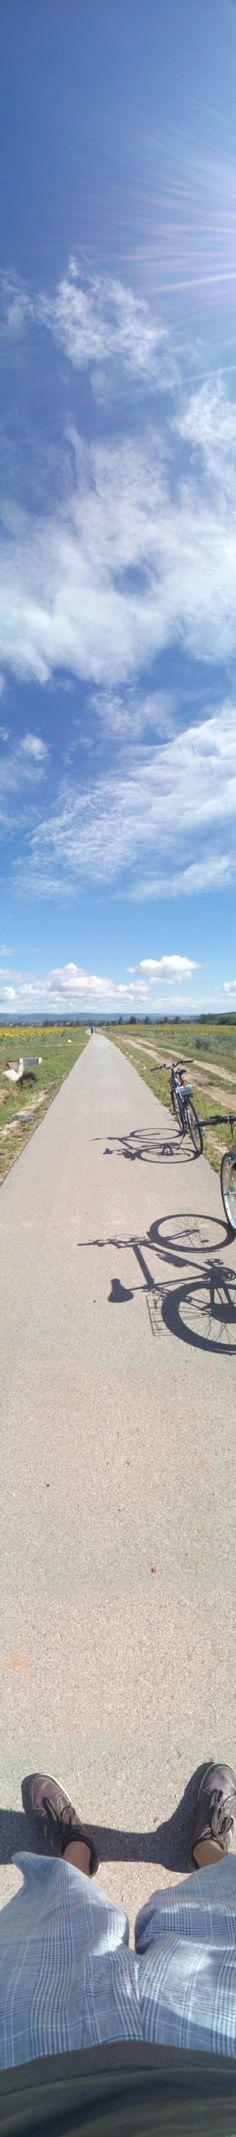 Cycling - Panorama Pic